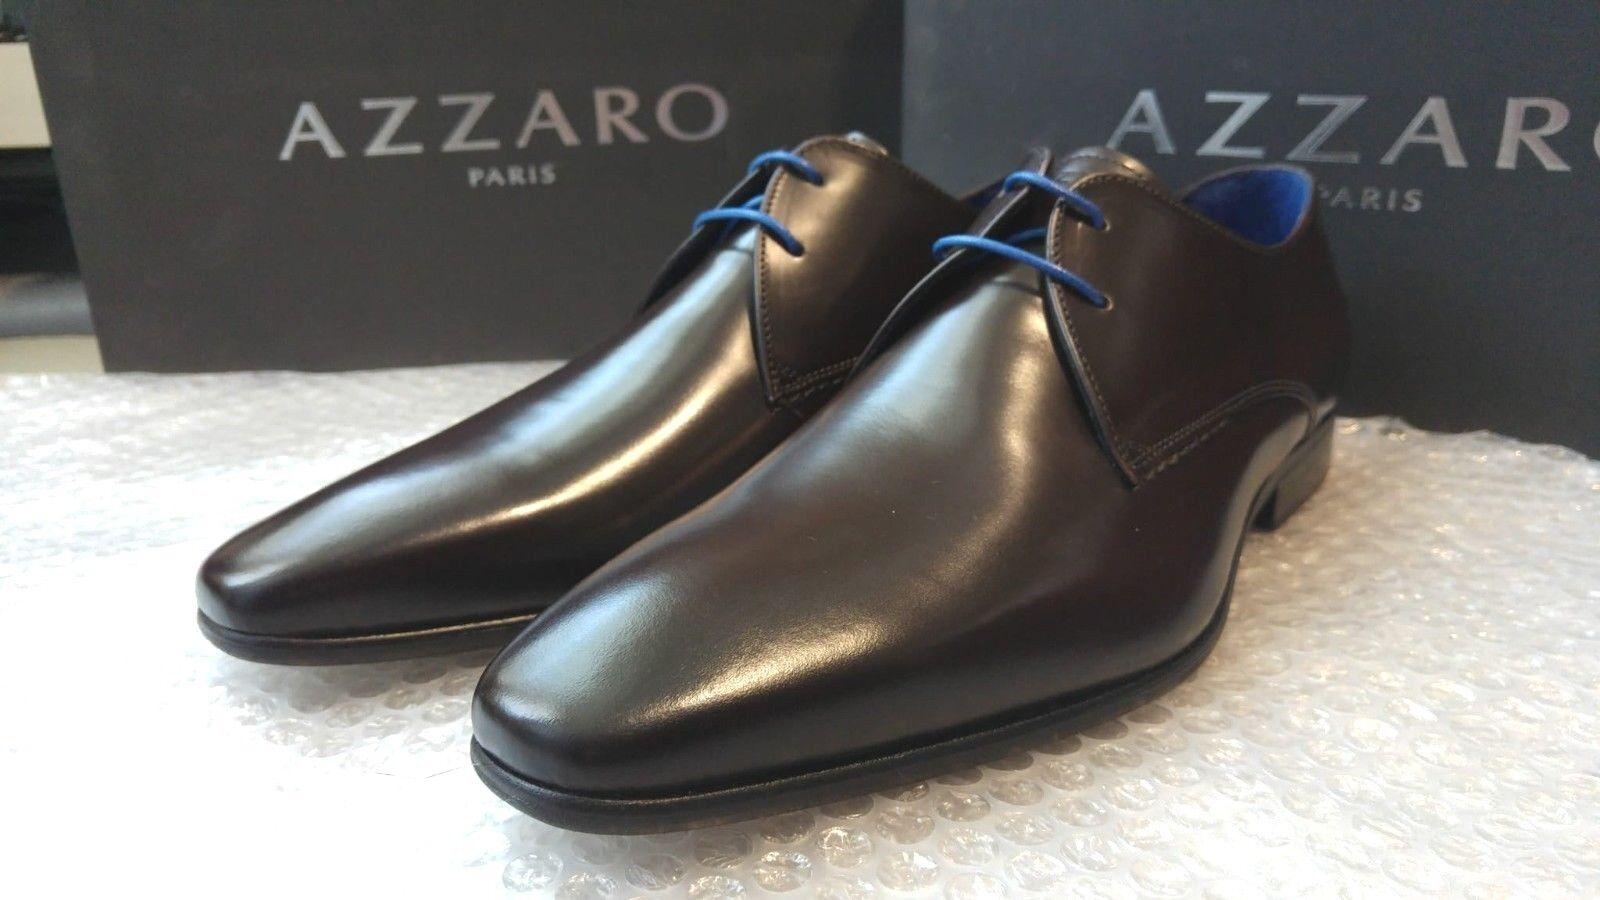 Azzaro Paris  Jurical  herren schuhe Größe 43 (8.5UK)